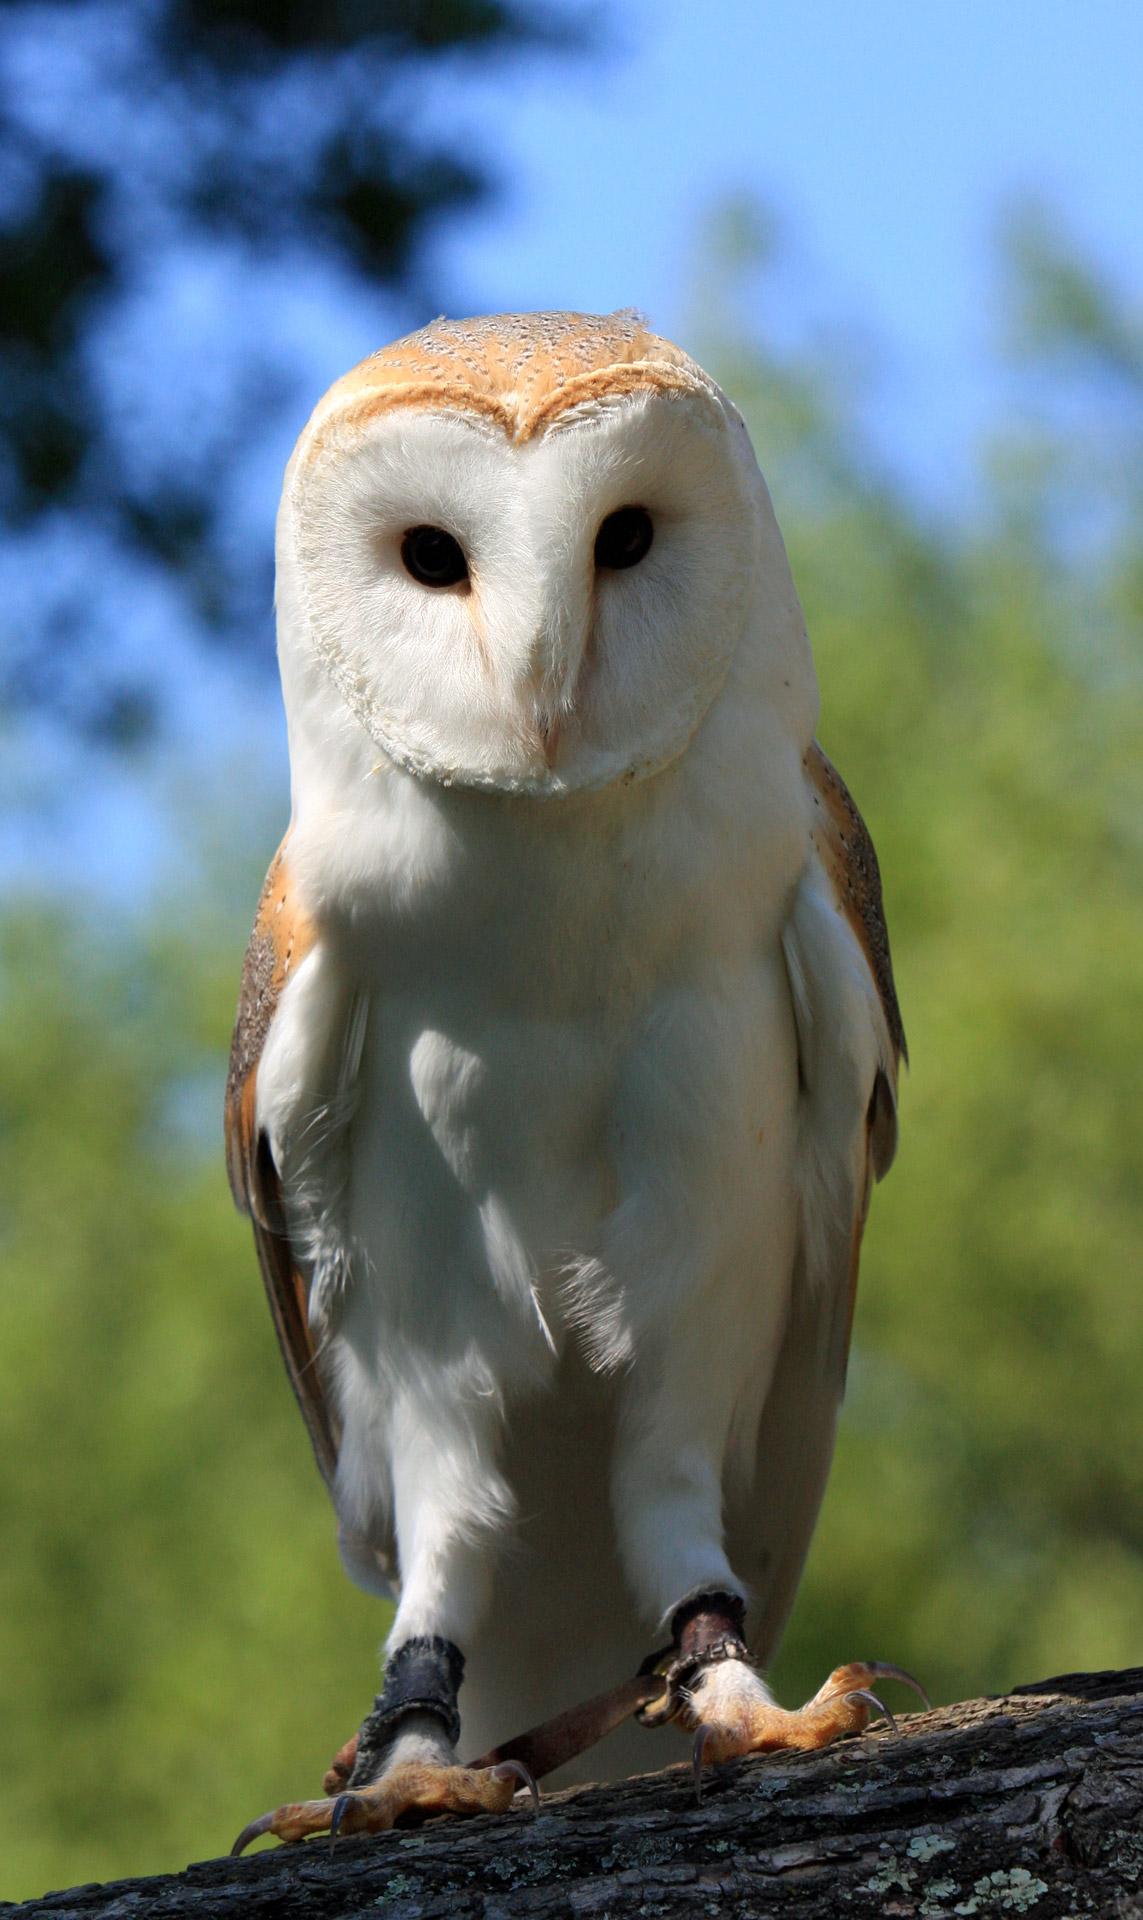 Barn Owl Portrait Closeup Free Stock Photo  Public